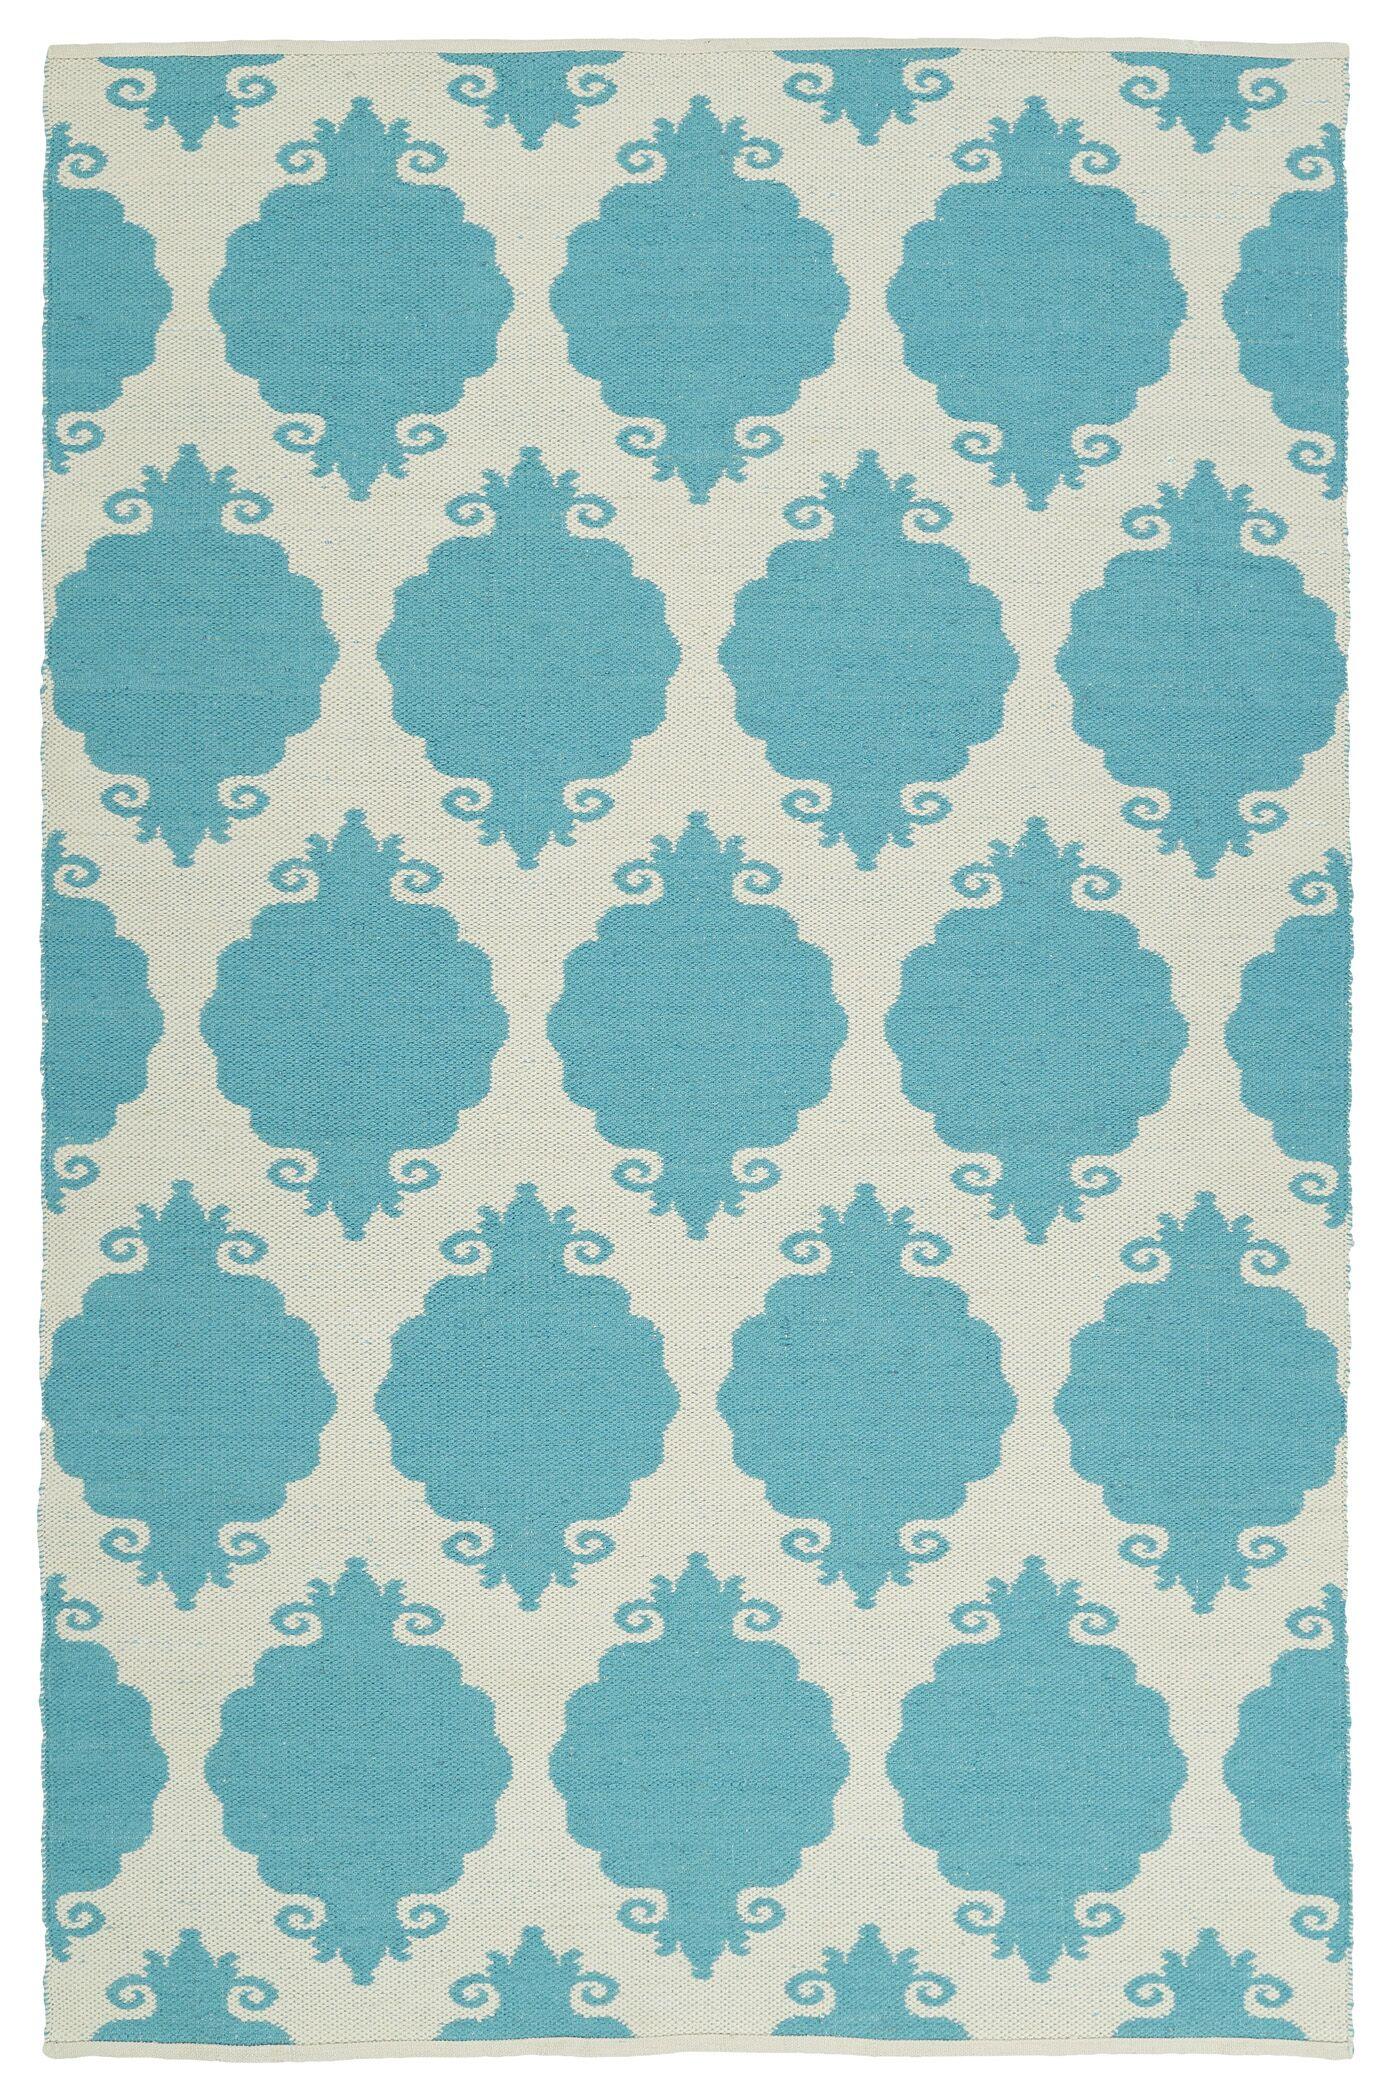 Dominic Turquoise/Cream Indoor/Outdoor Area Rug Rug Size: Rectangle 8' x 10'